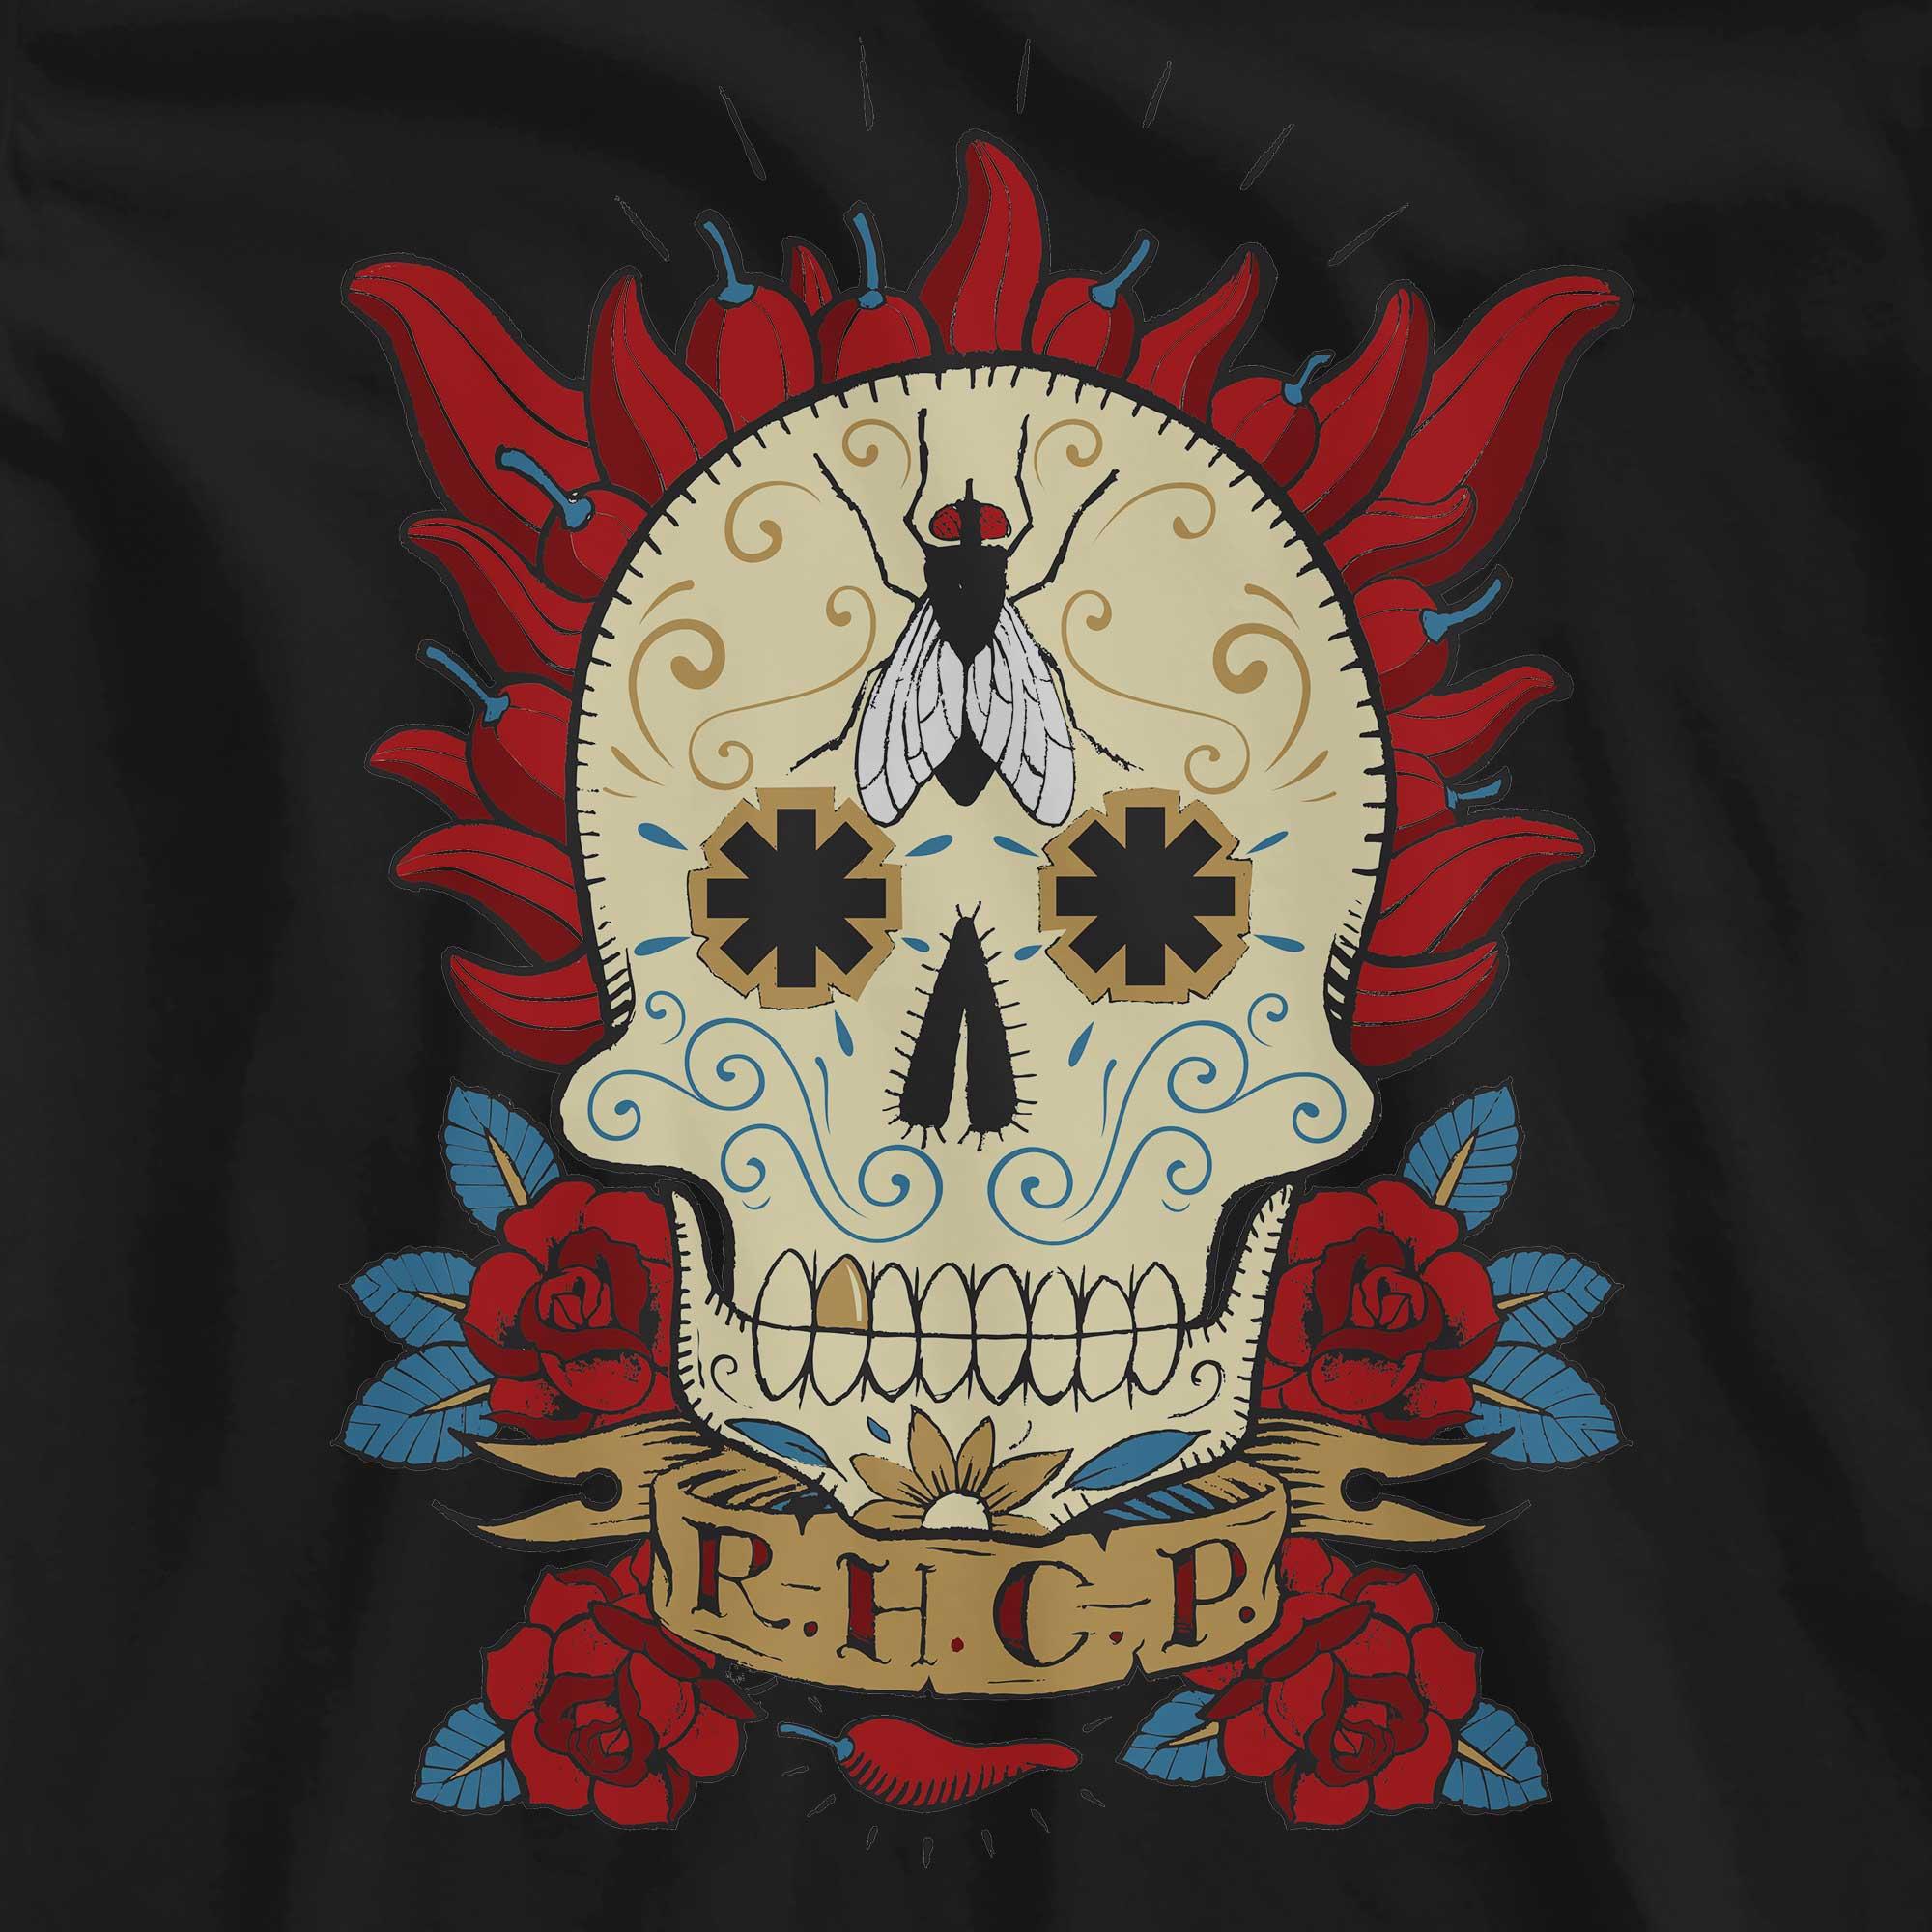 Camiseta Caveira Mexicana - Red Hot Chili Peppers - Feminino